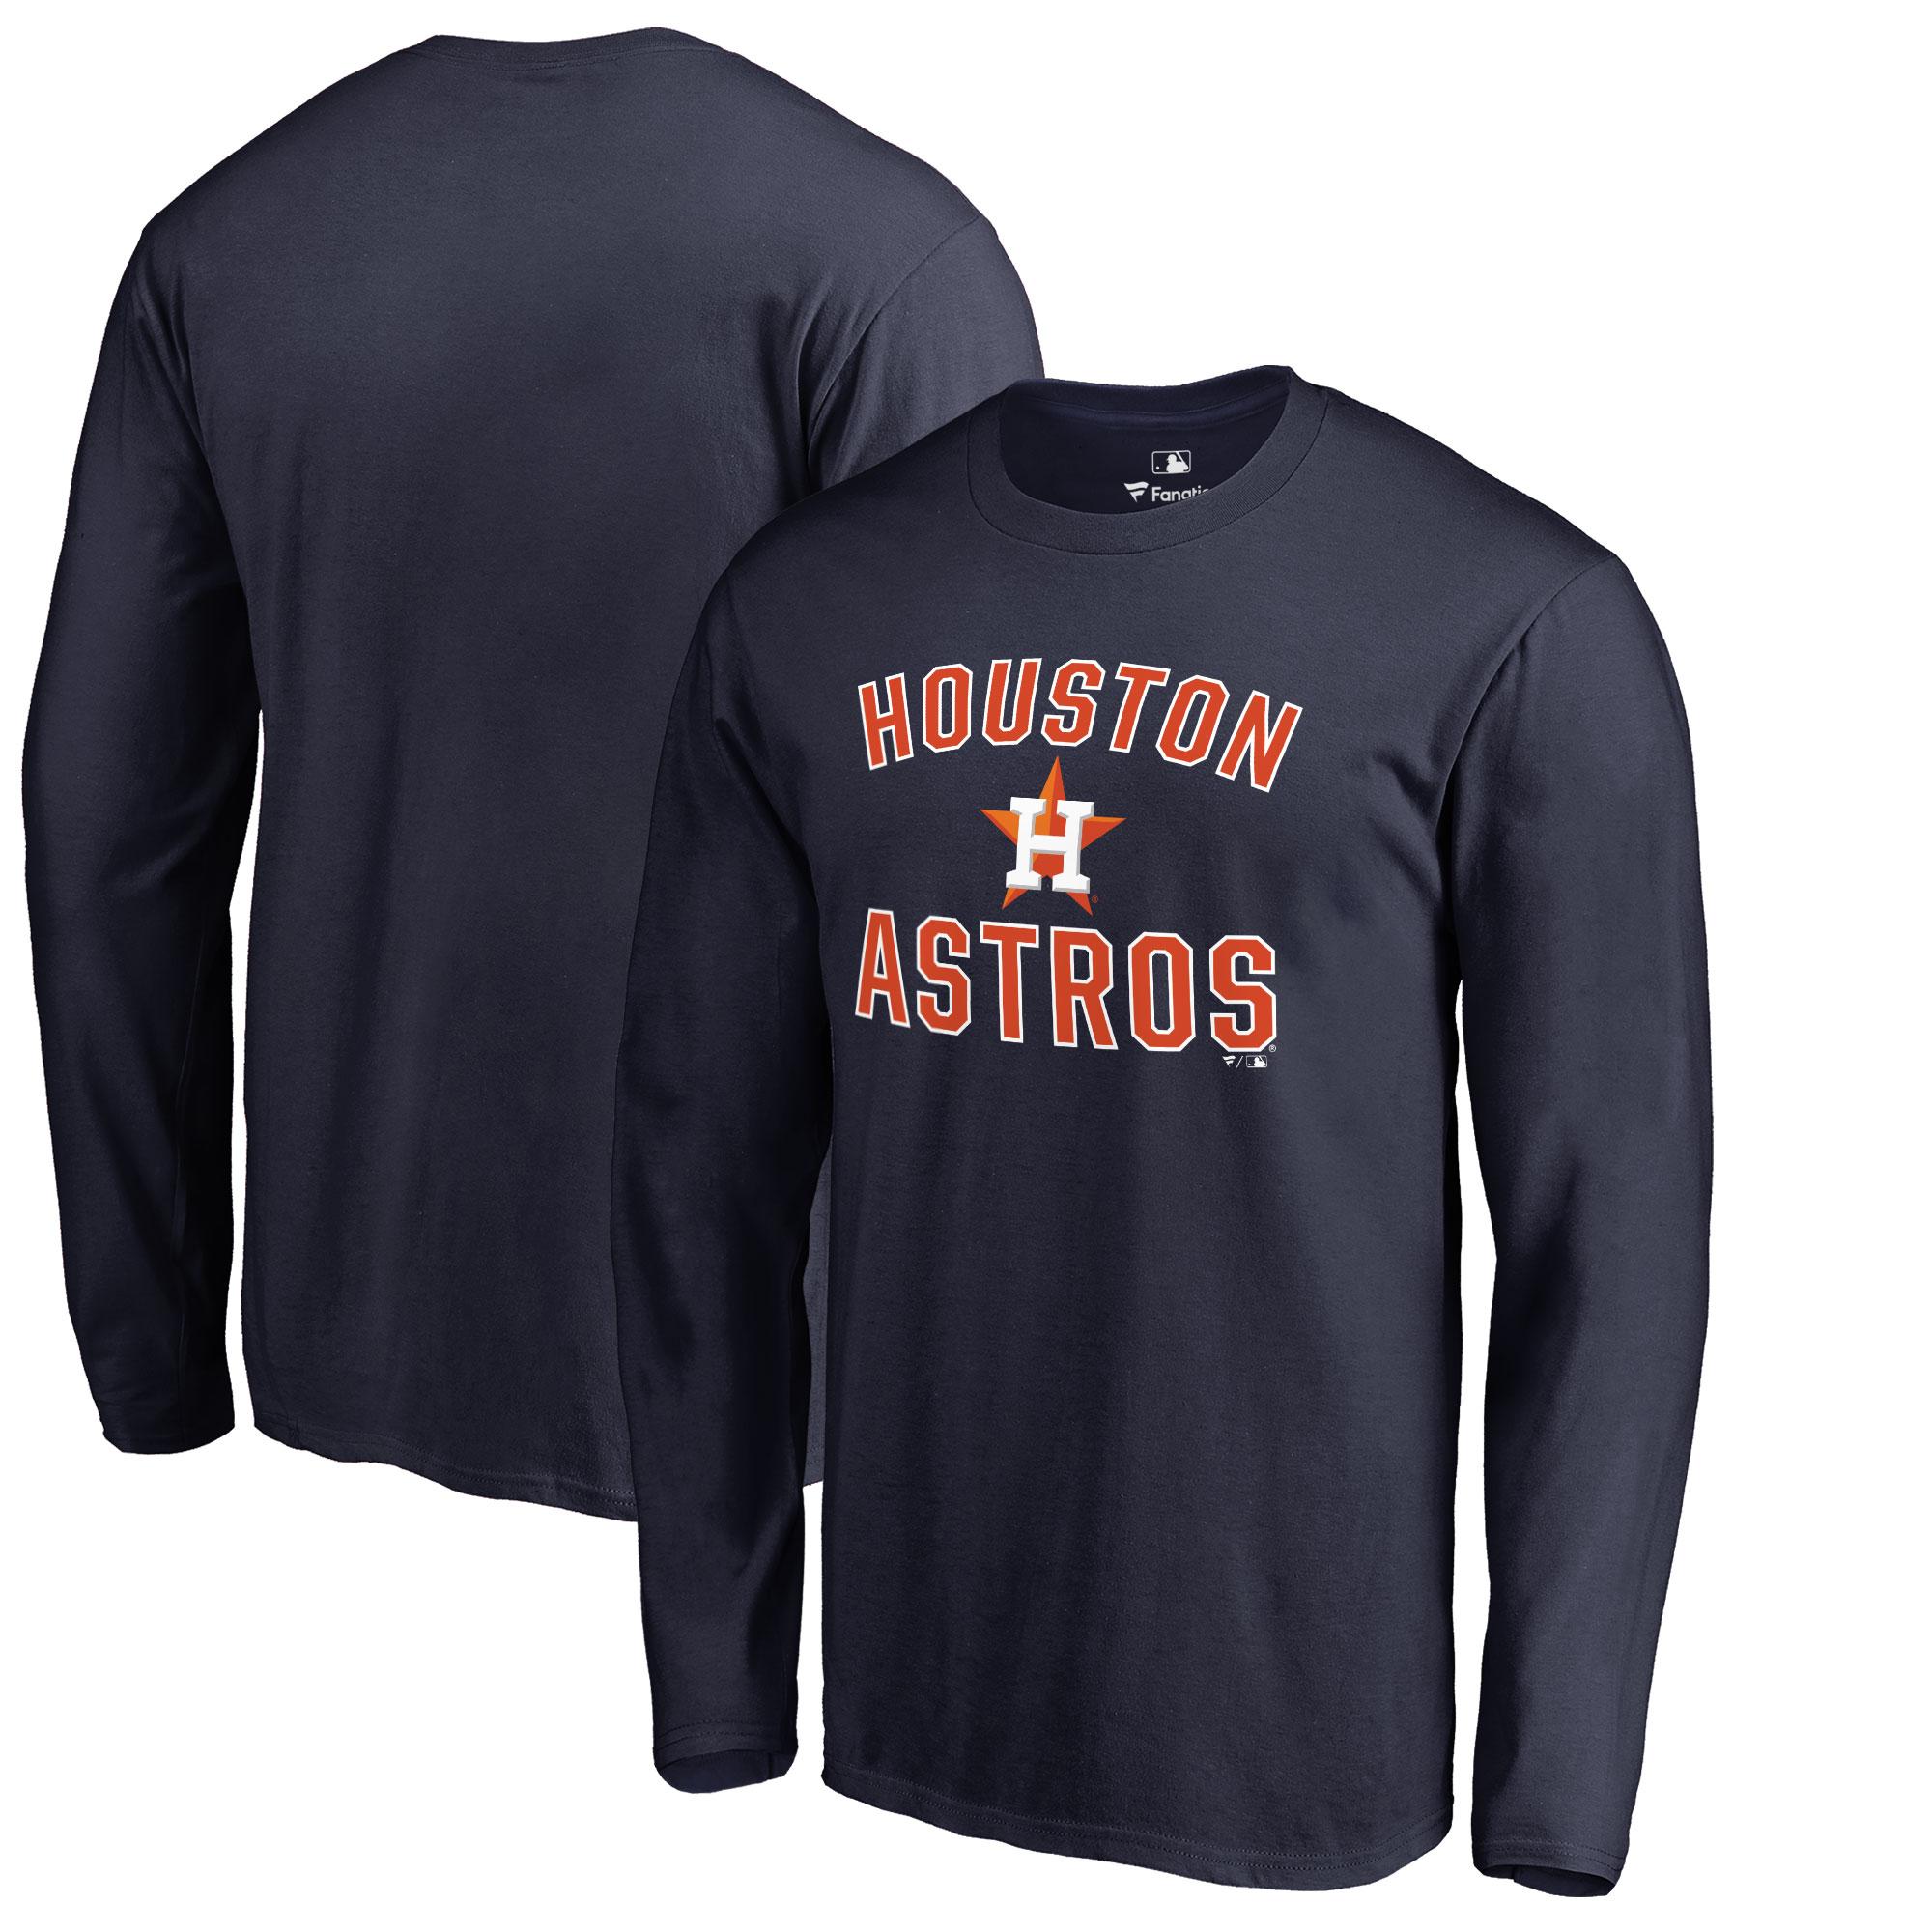 Houston Astros Victory Arch Big & Tall Long Sleeve T-Shirt - Navy